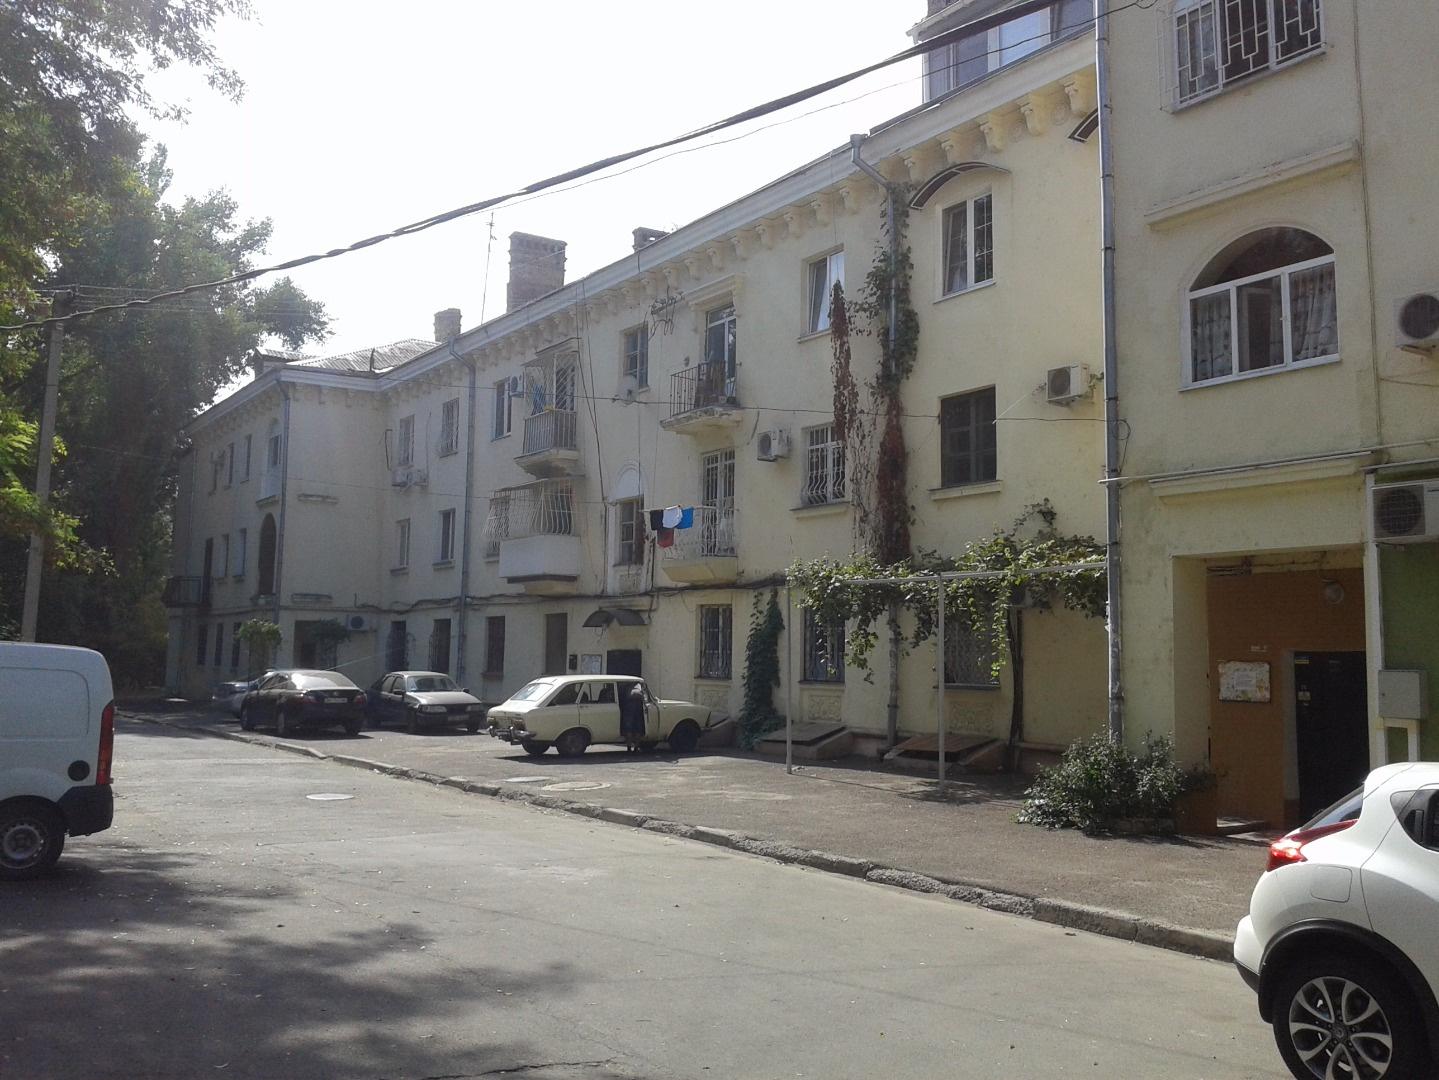 Продается 3-комнатная квартира на ул. Семинарская (Гамарника) — 80 000 у.е. (фото №5)